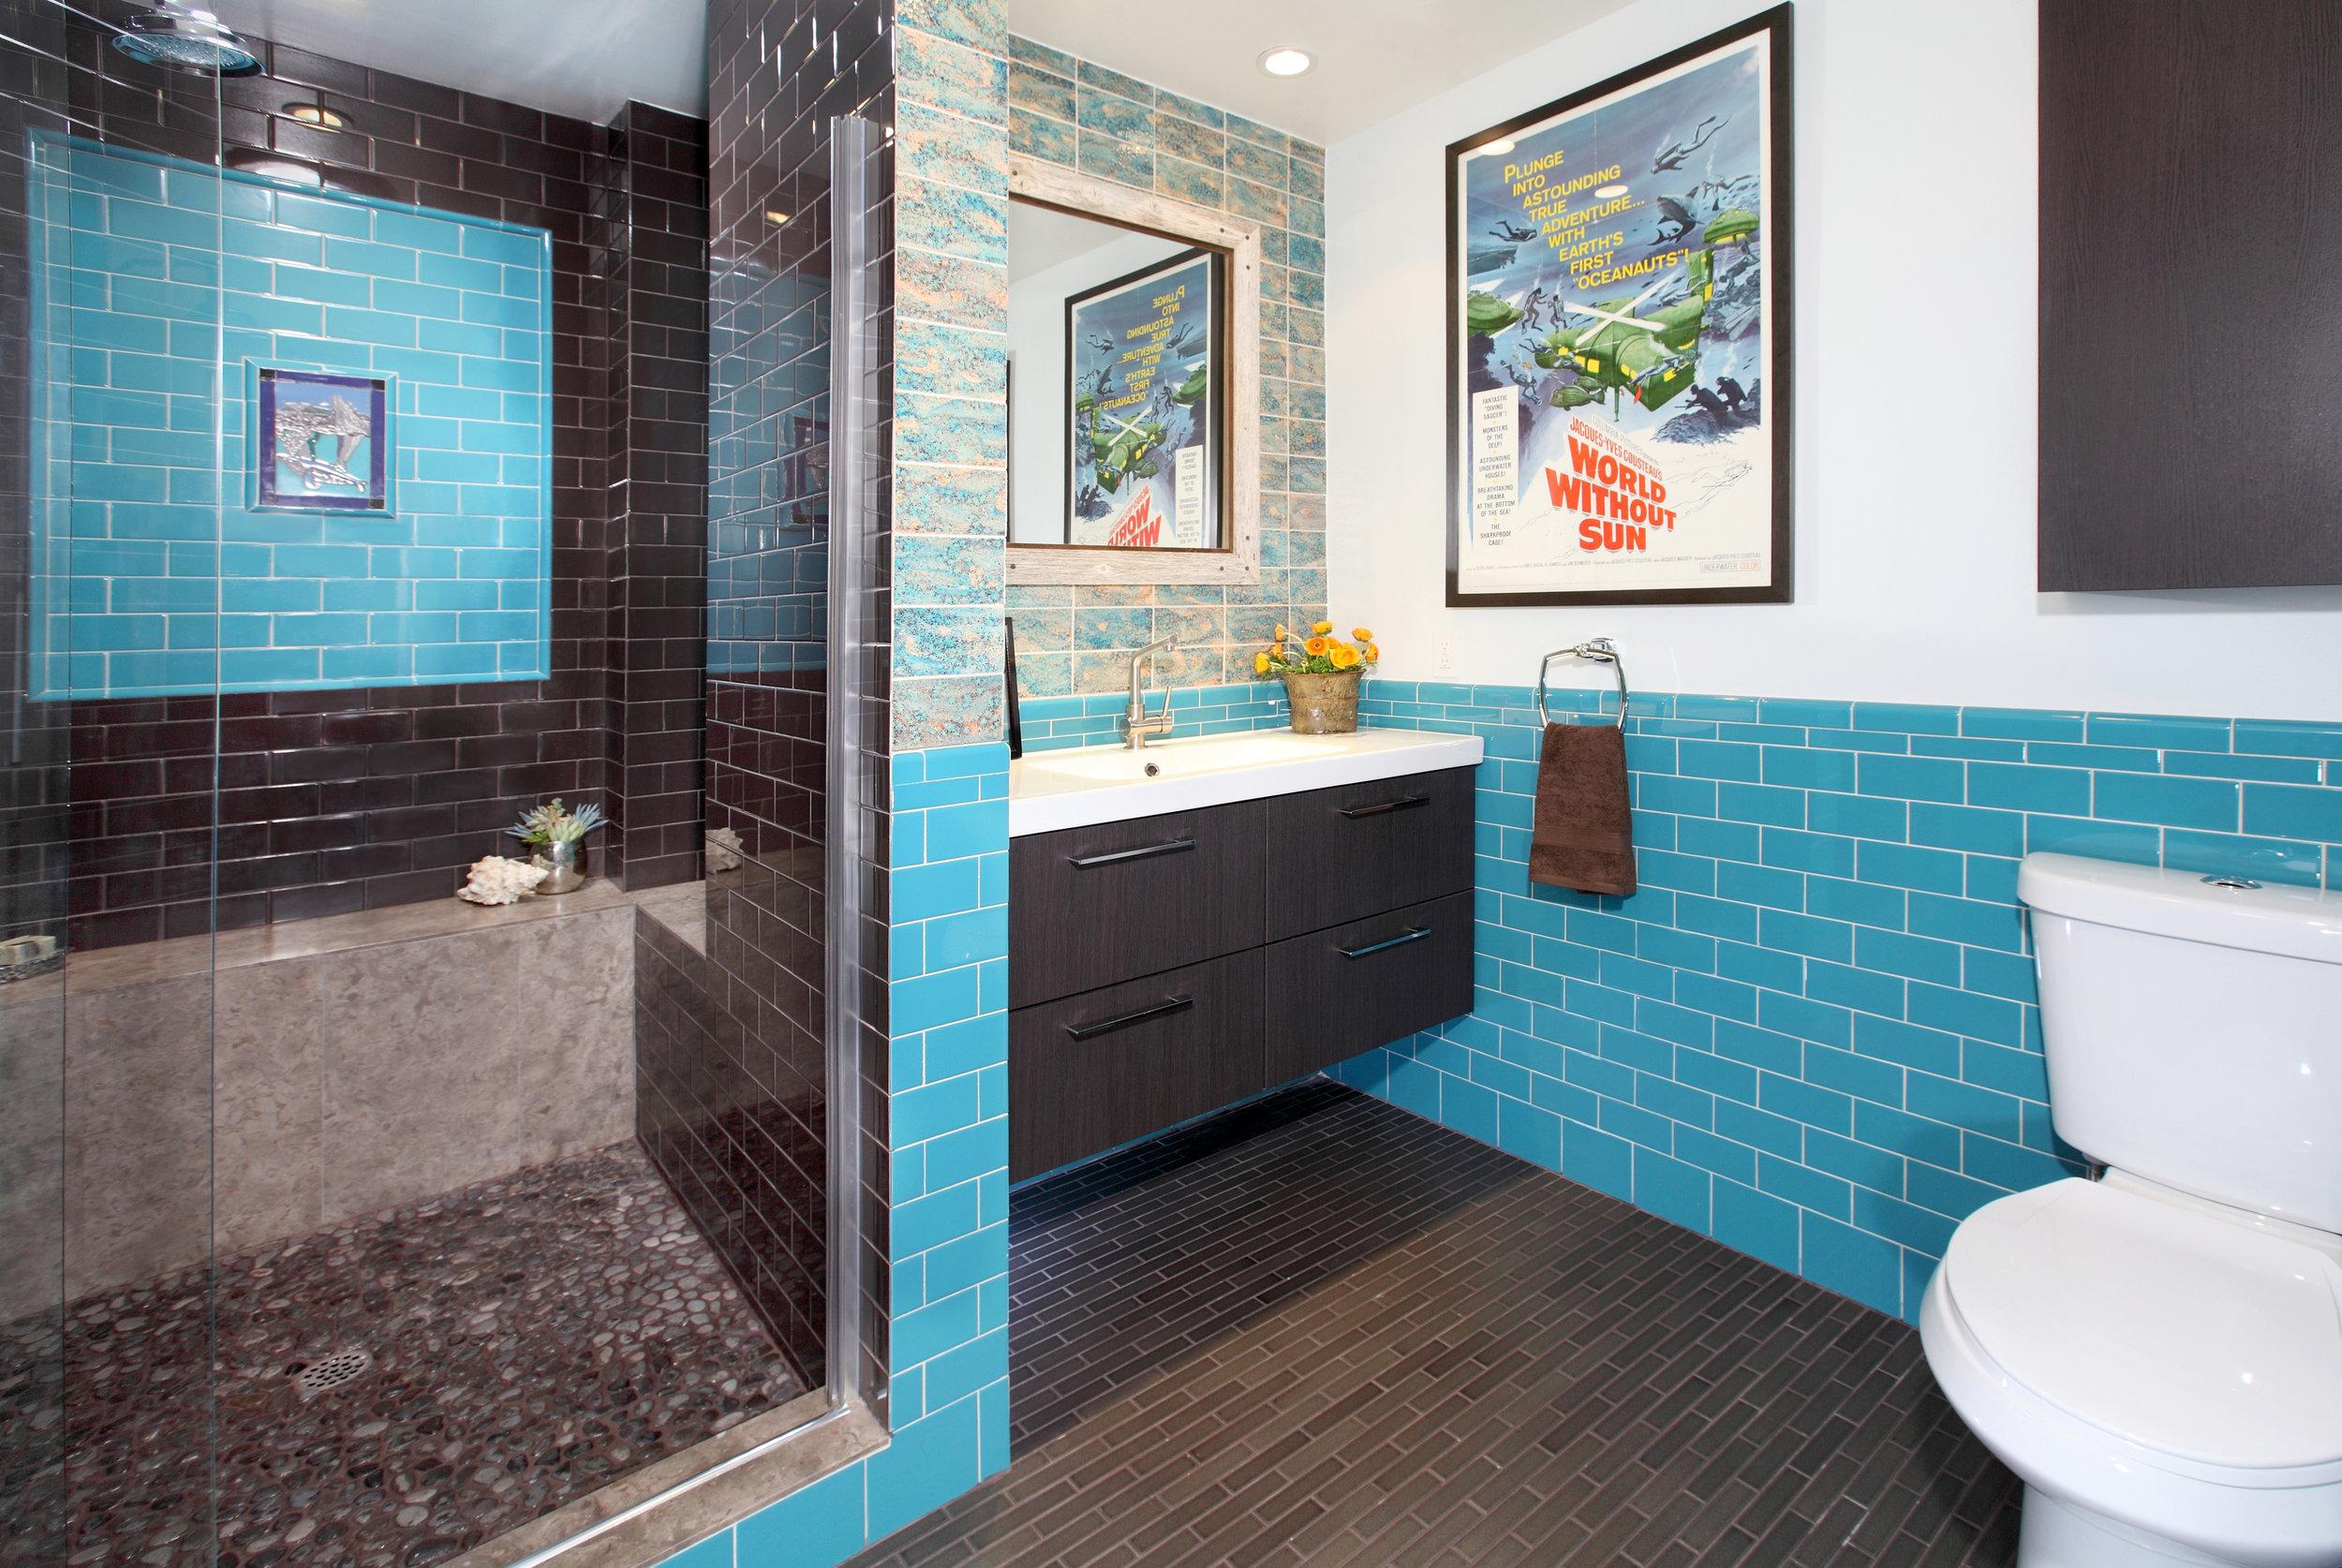 sarah-barnard-design-historic-west-hollywood-bungalow-05.jpg